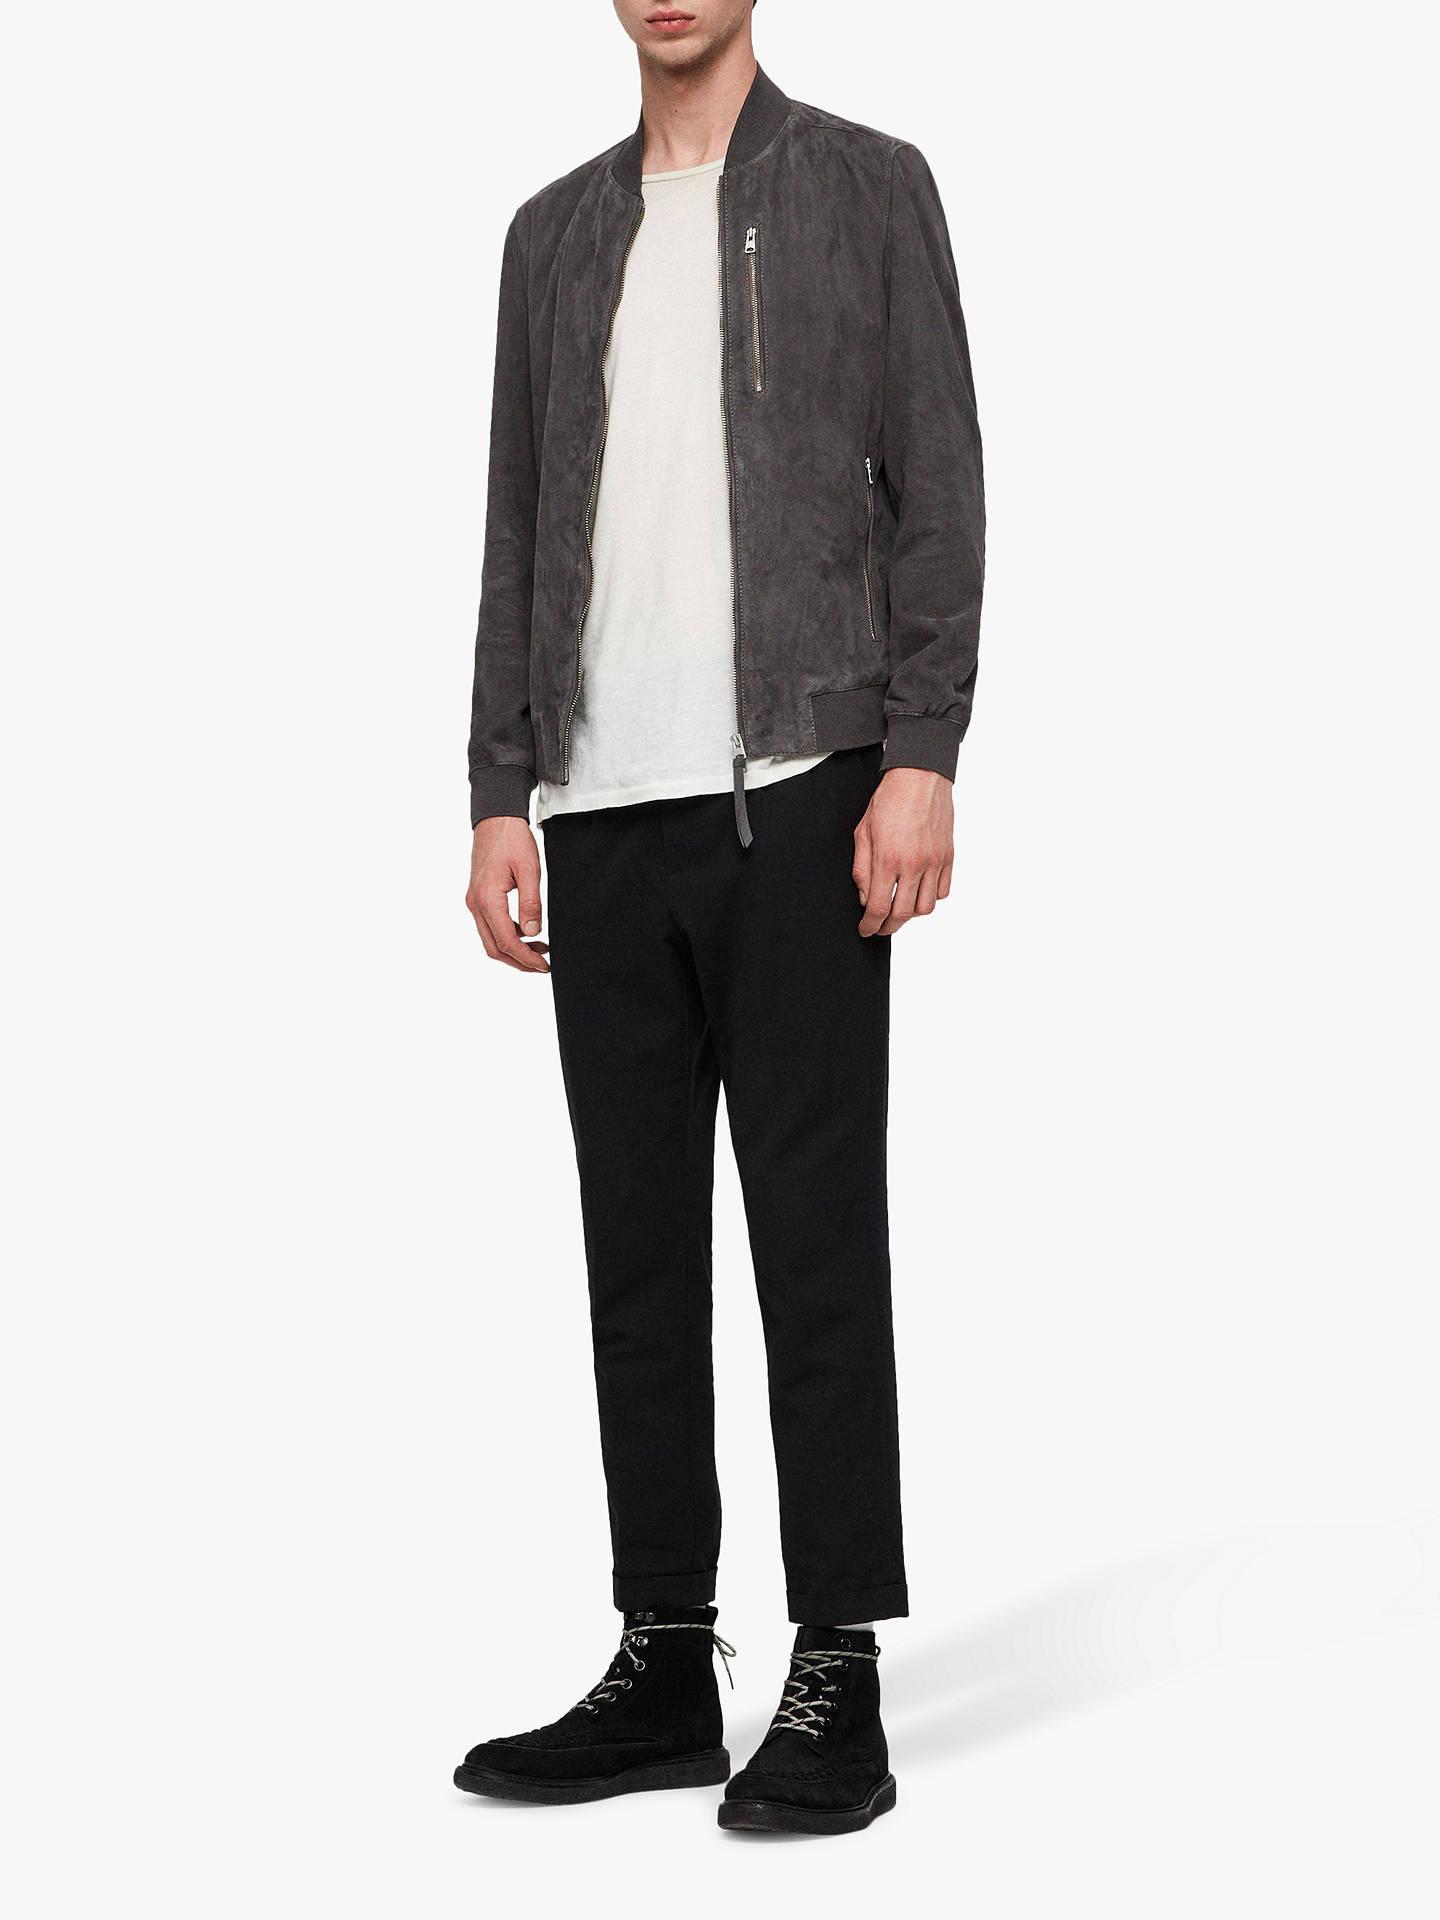 ae60191b10 Buy AllSaints Kemble Suede Slim Fit Bomber Jacket